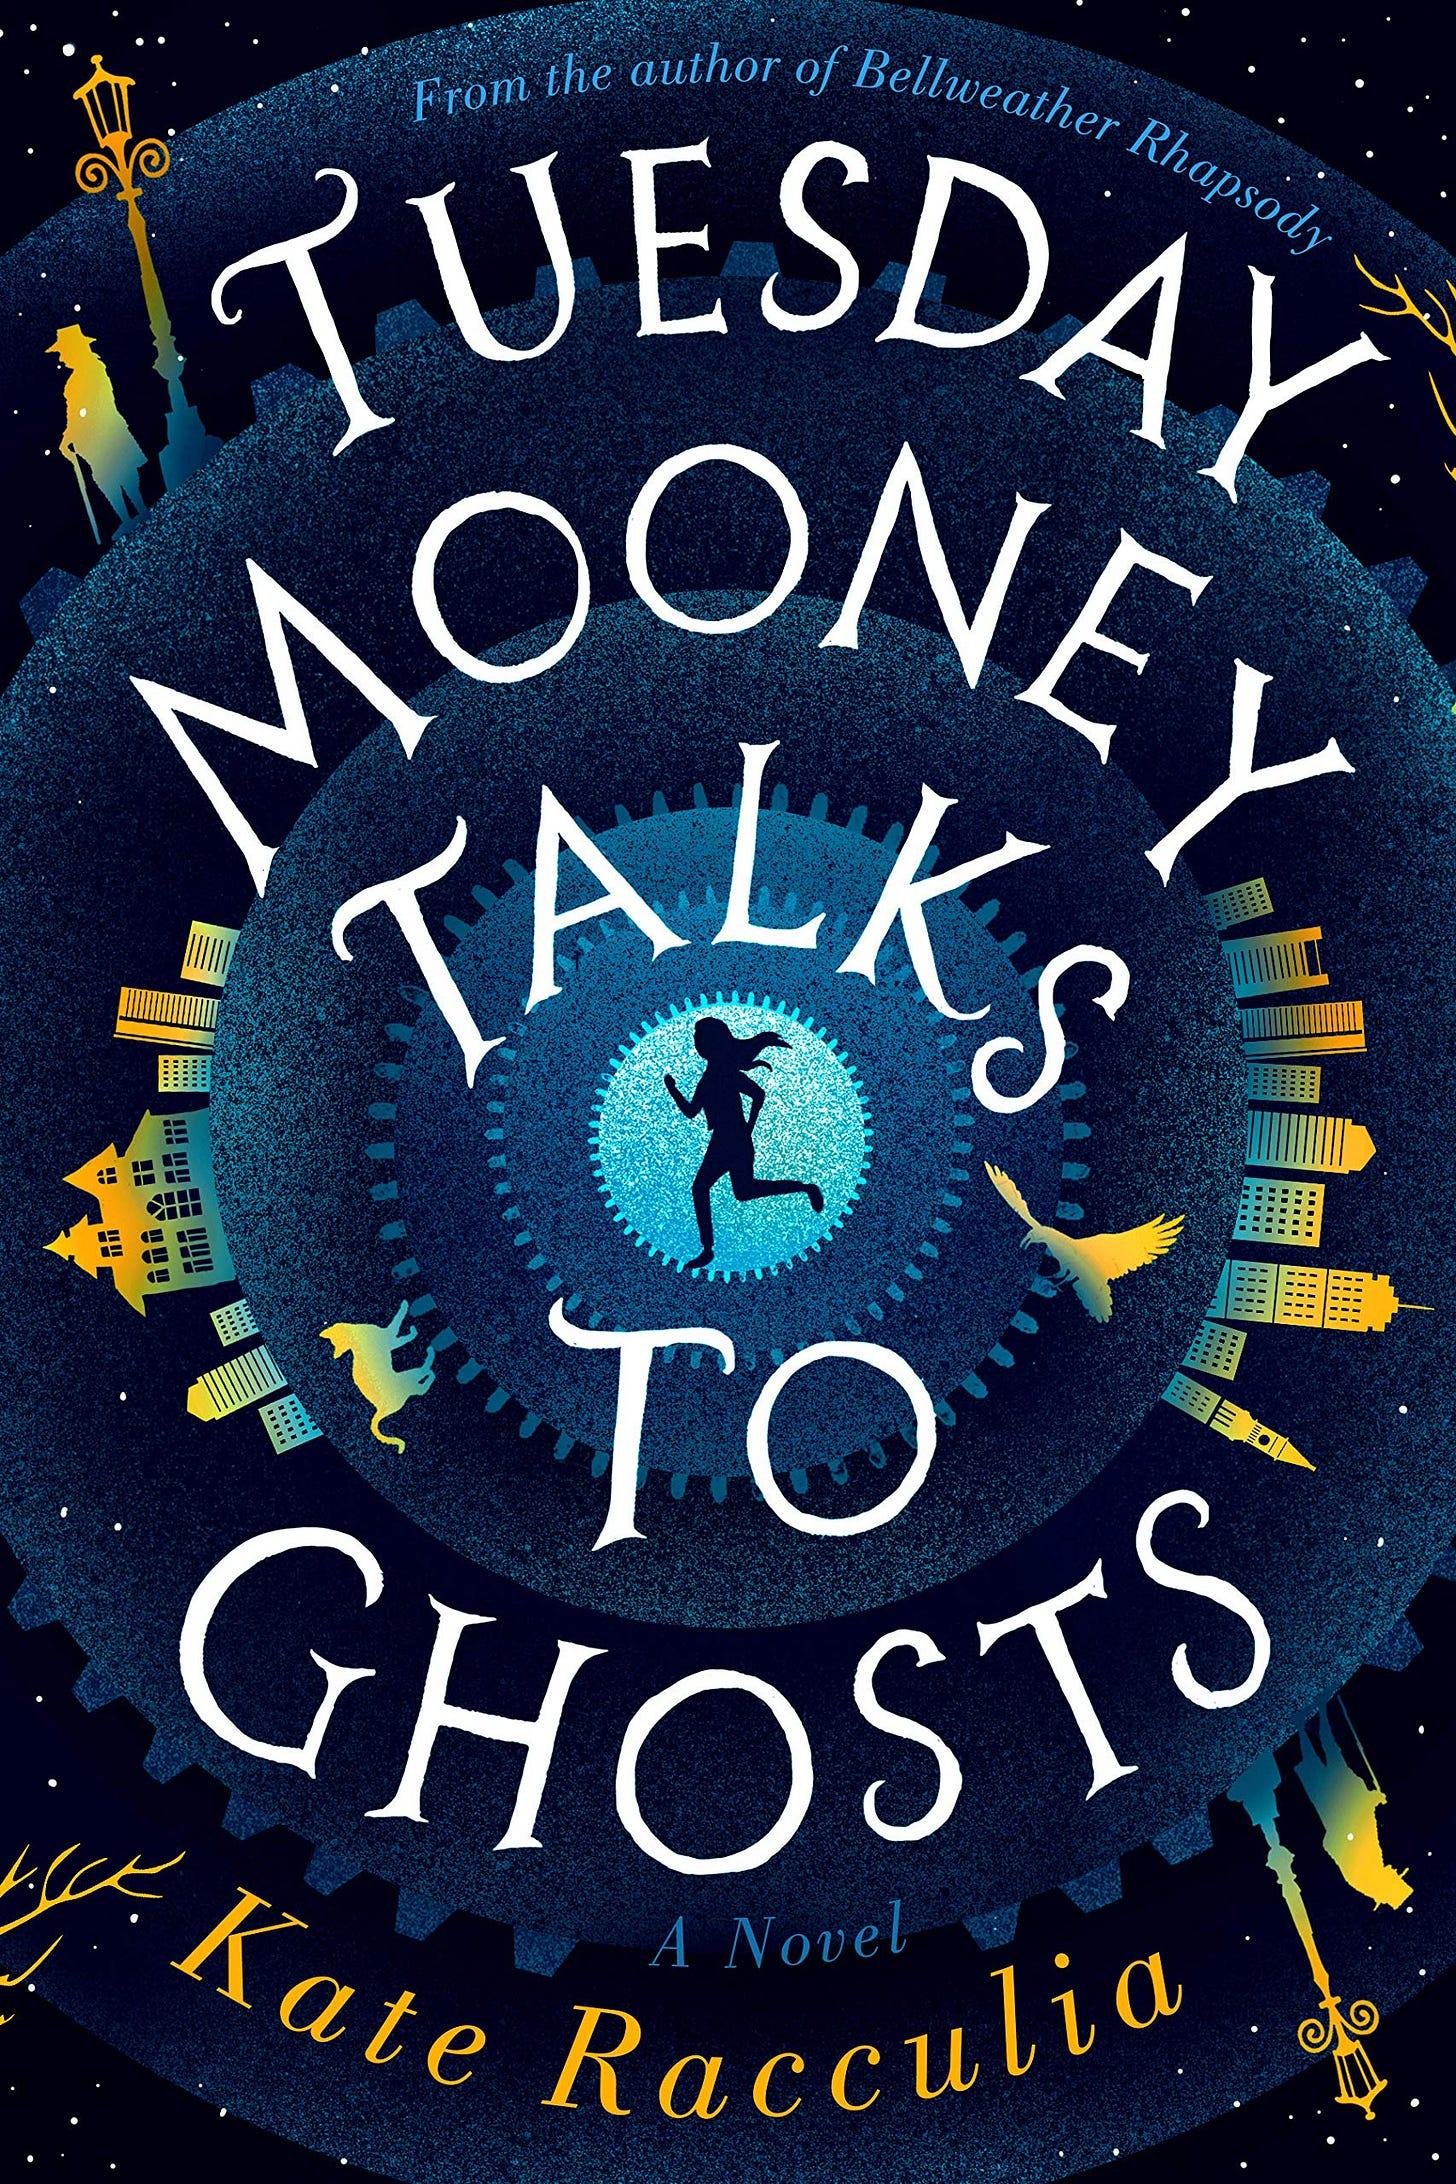 Amazon.com: Tuesday Mooney Talks to Ghosts: 9780358023937: Racculia, Kate:  Books